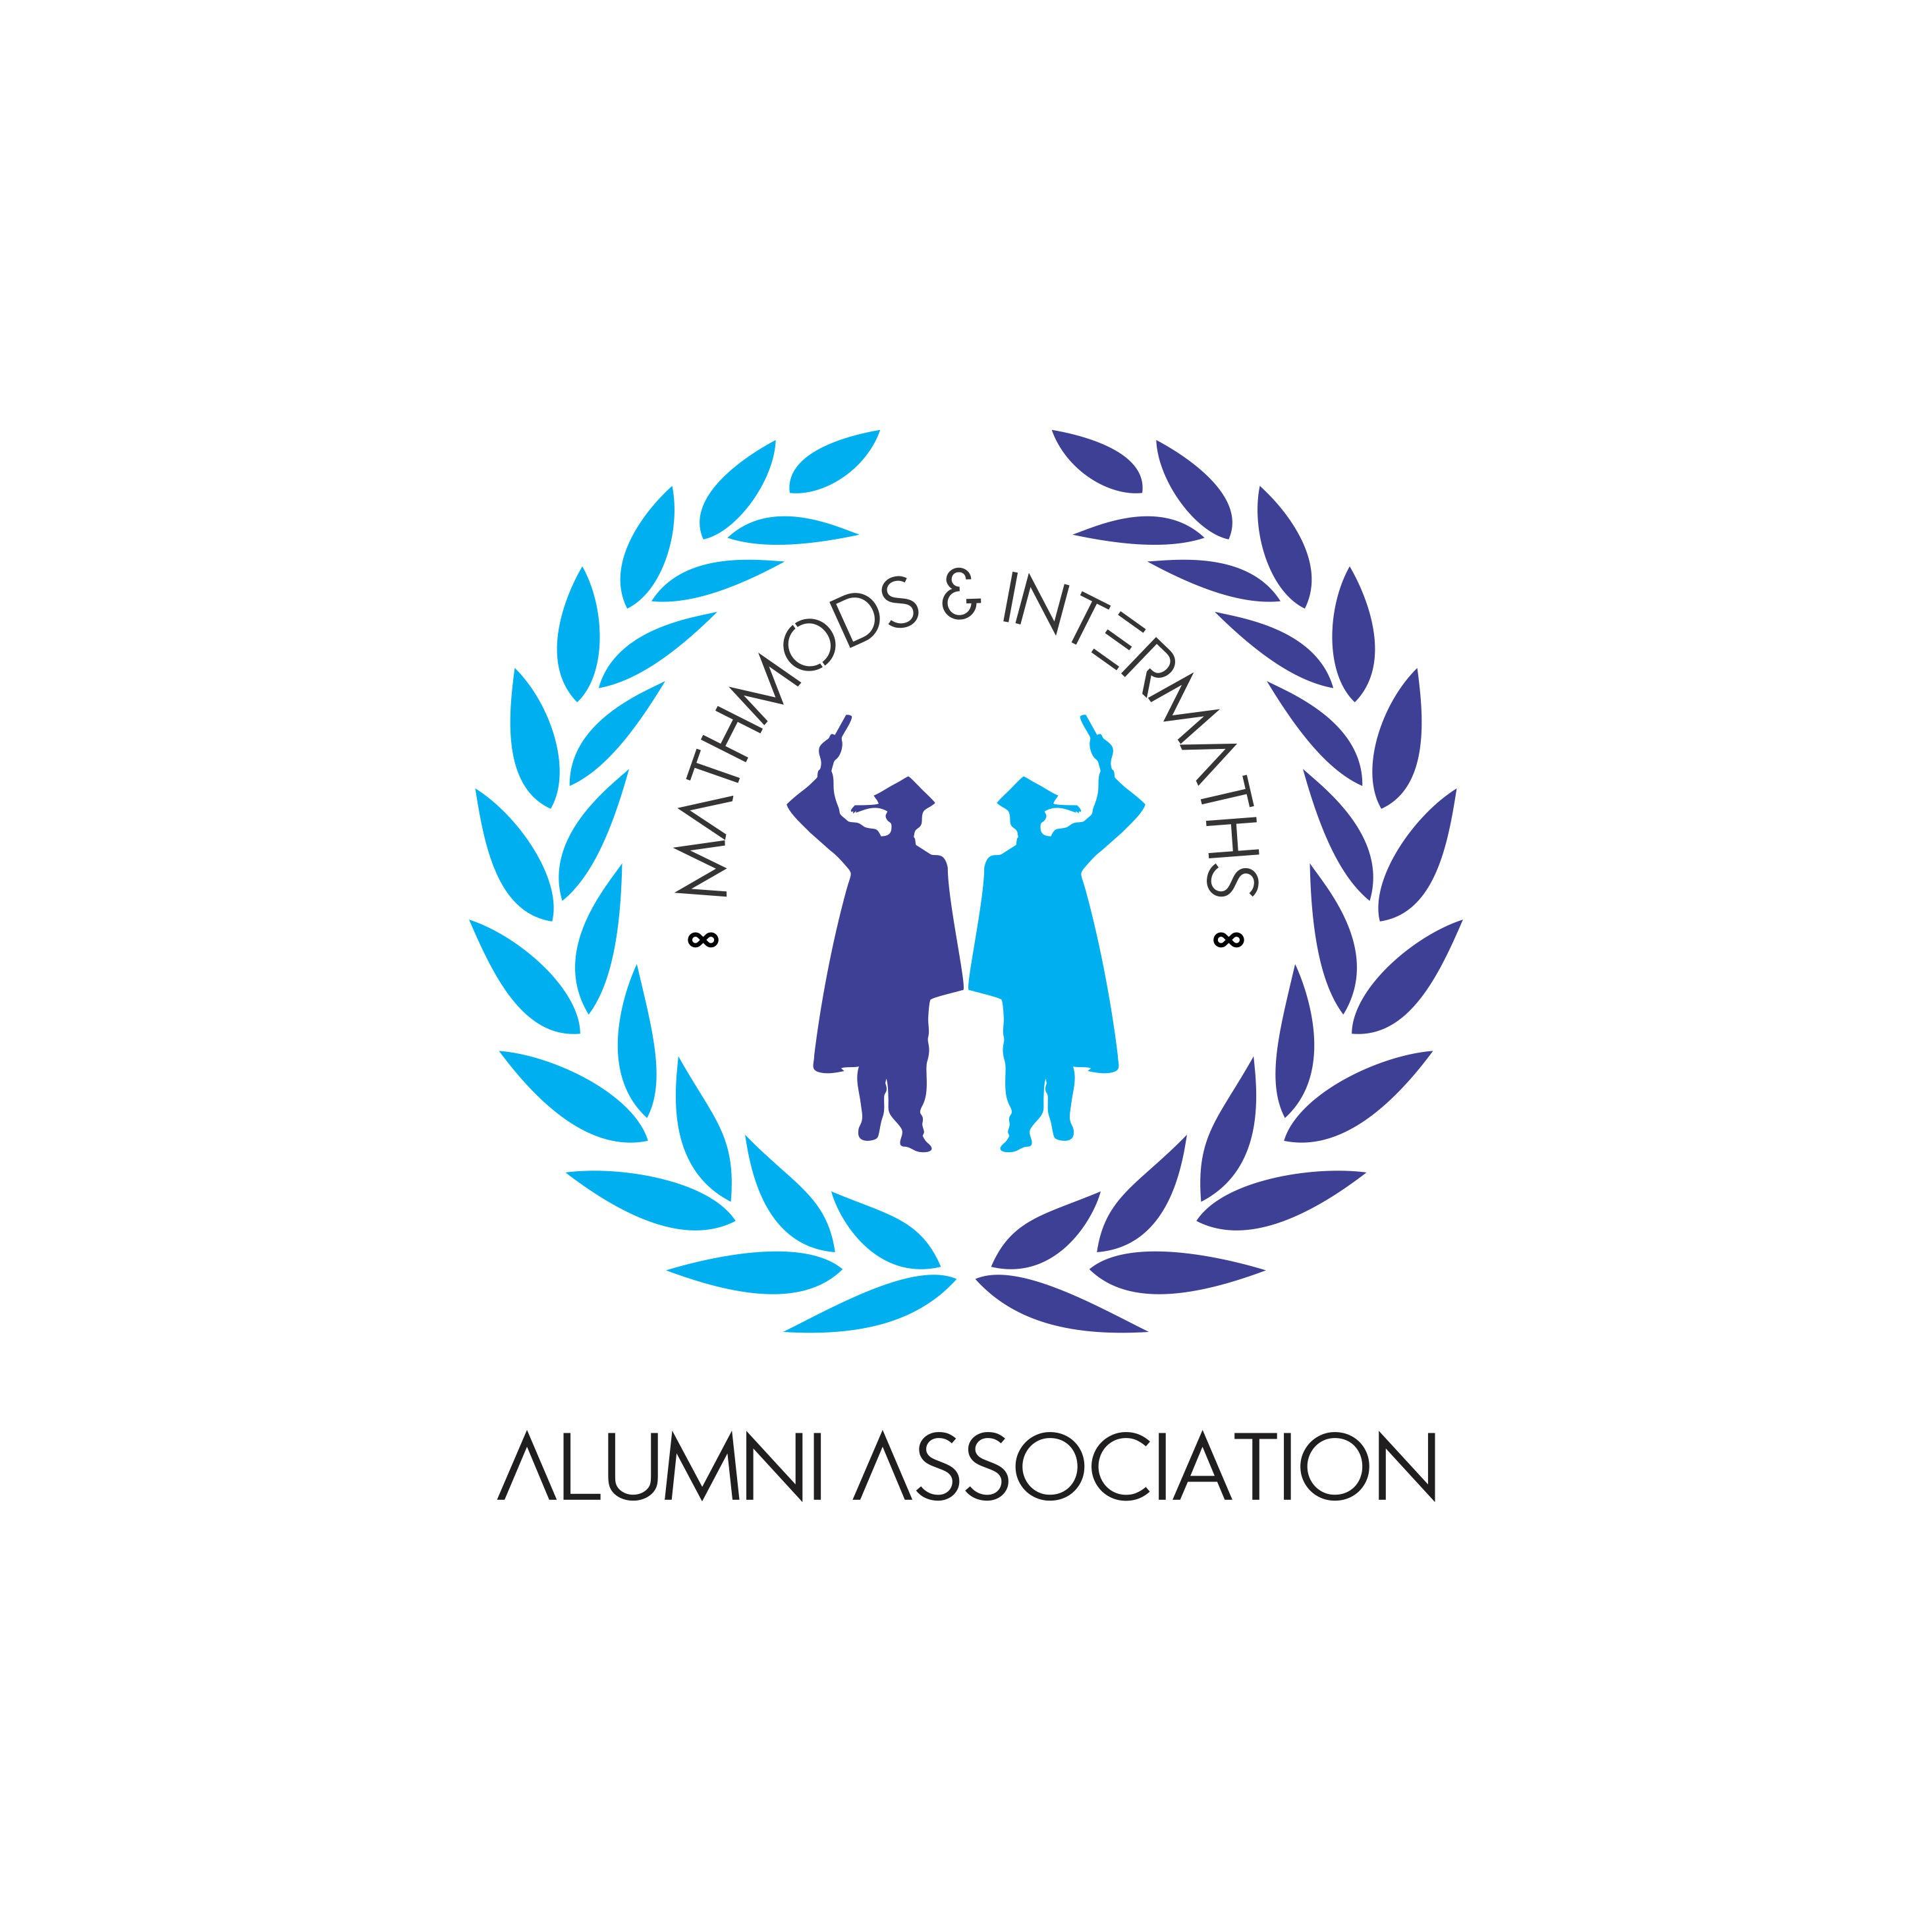 Alumni Association (for international joint MSc degree) needs a logo